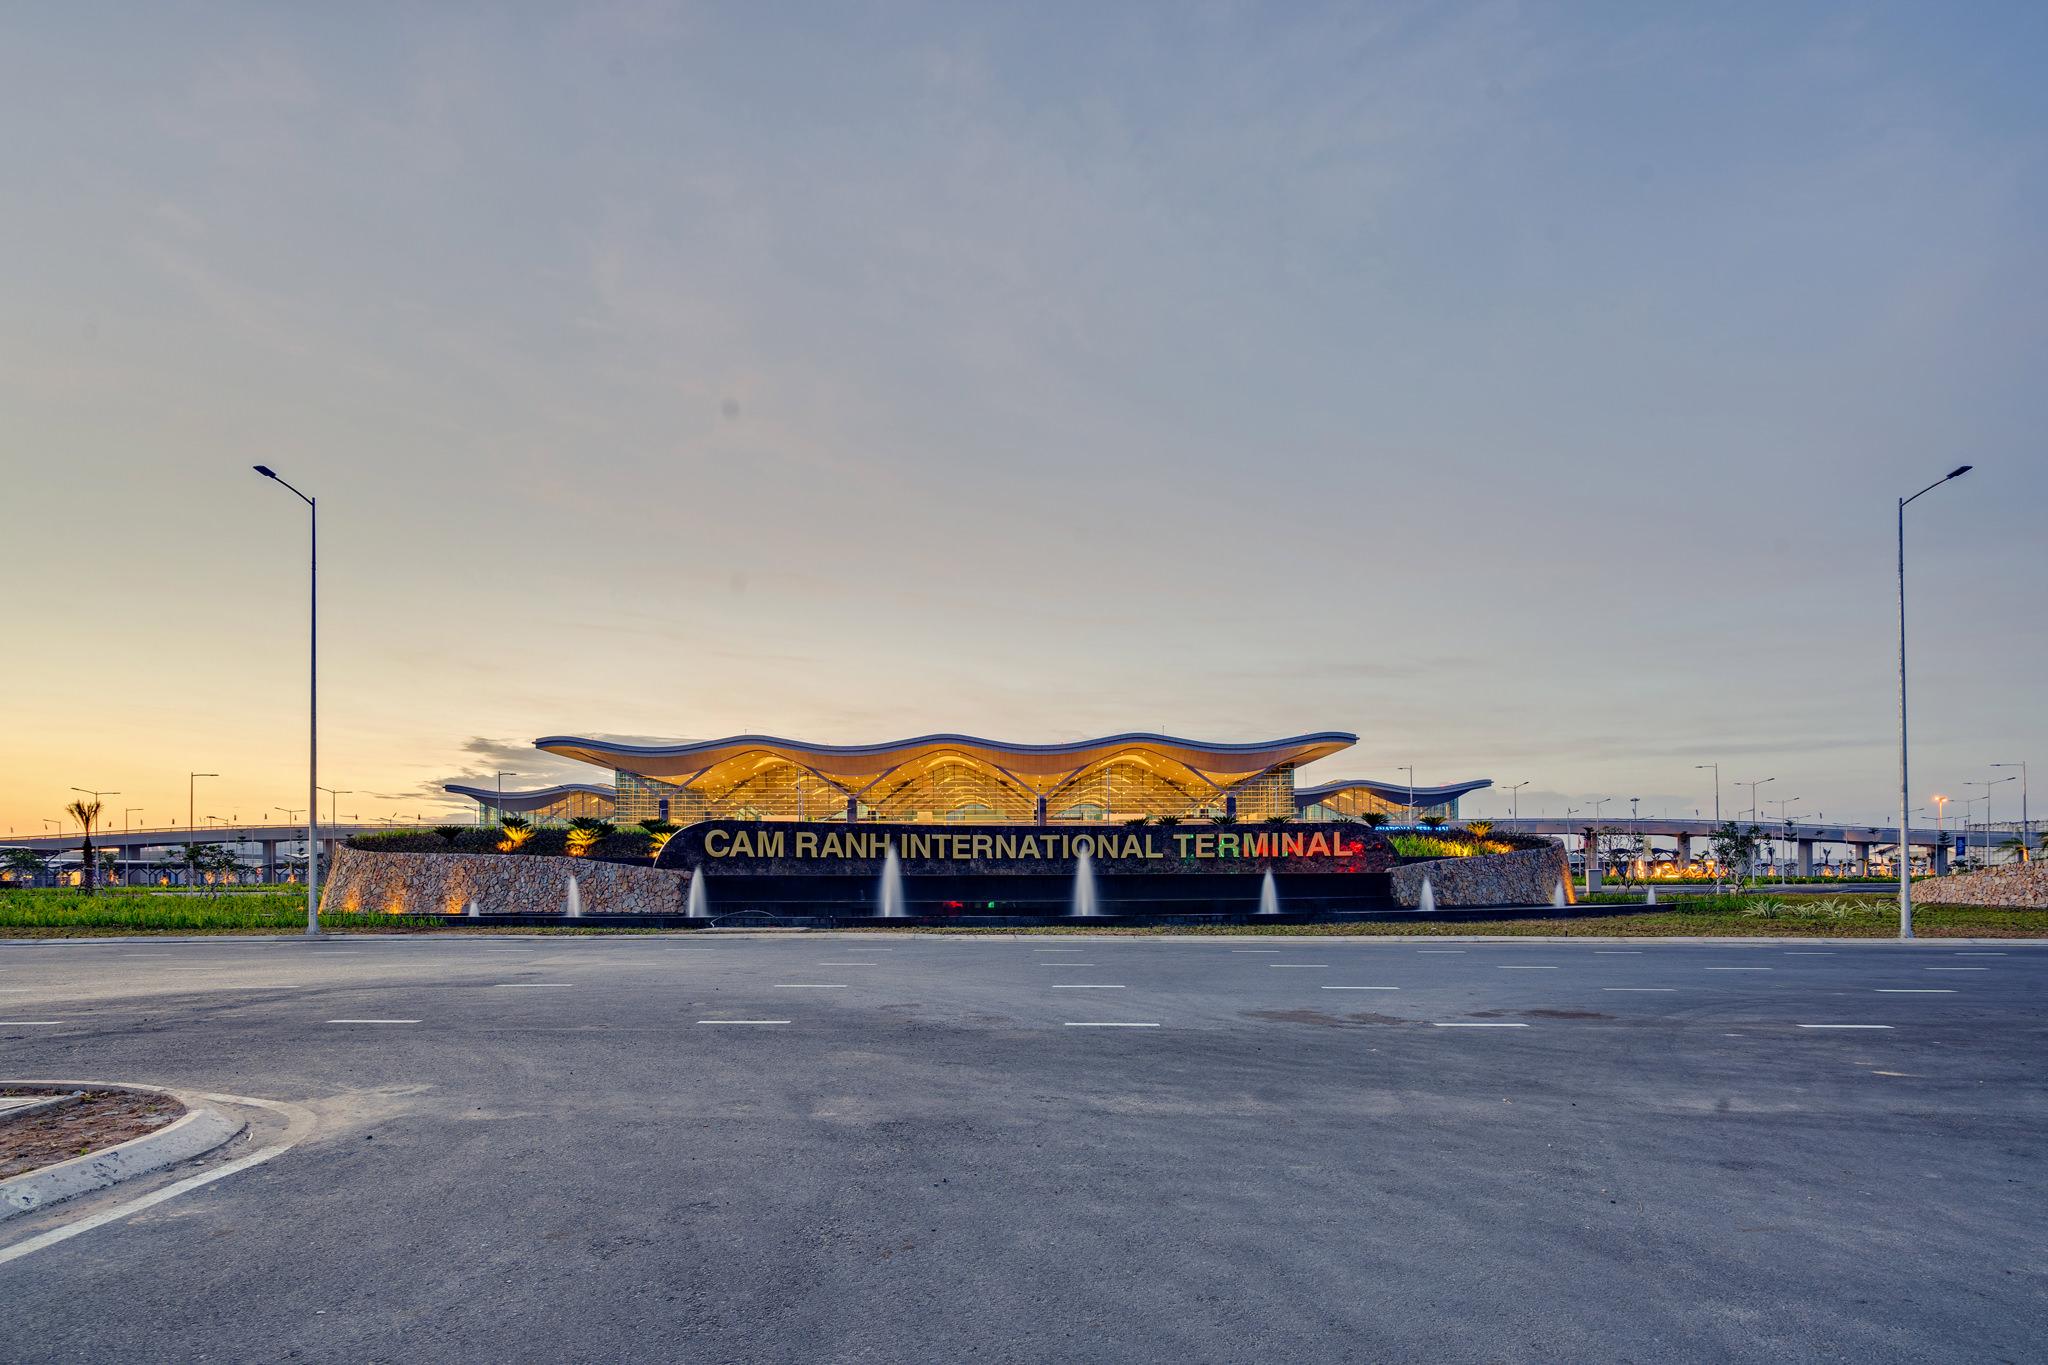 20180626 - Cam Ranh Airport - Architecture - 0003.jpg